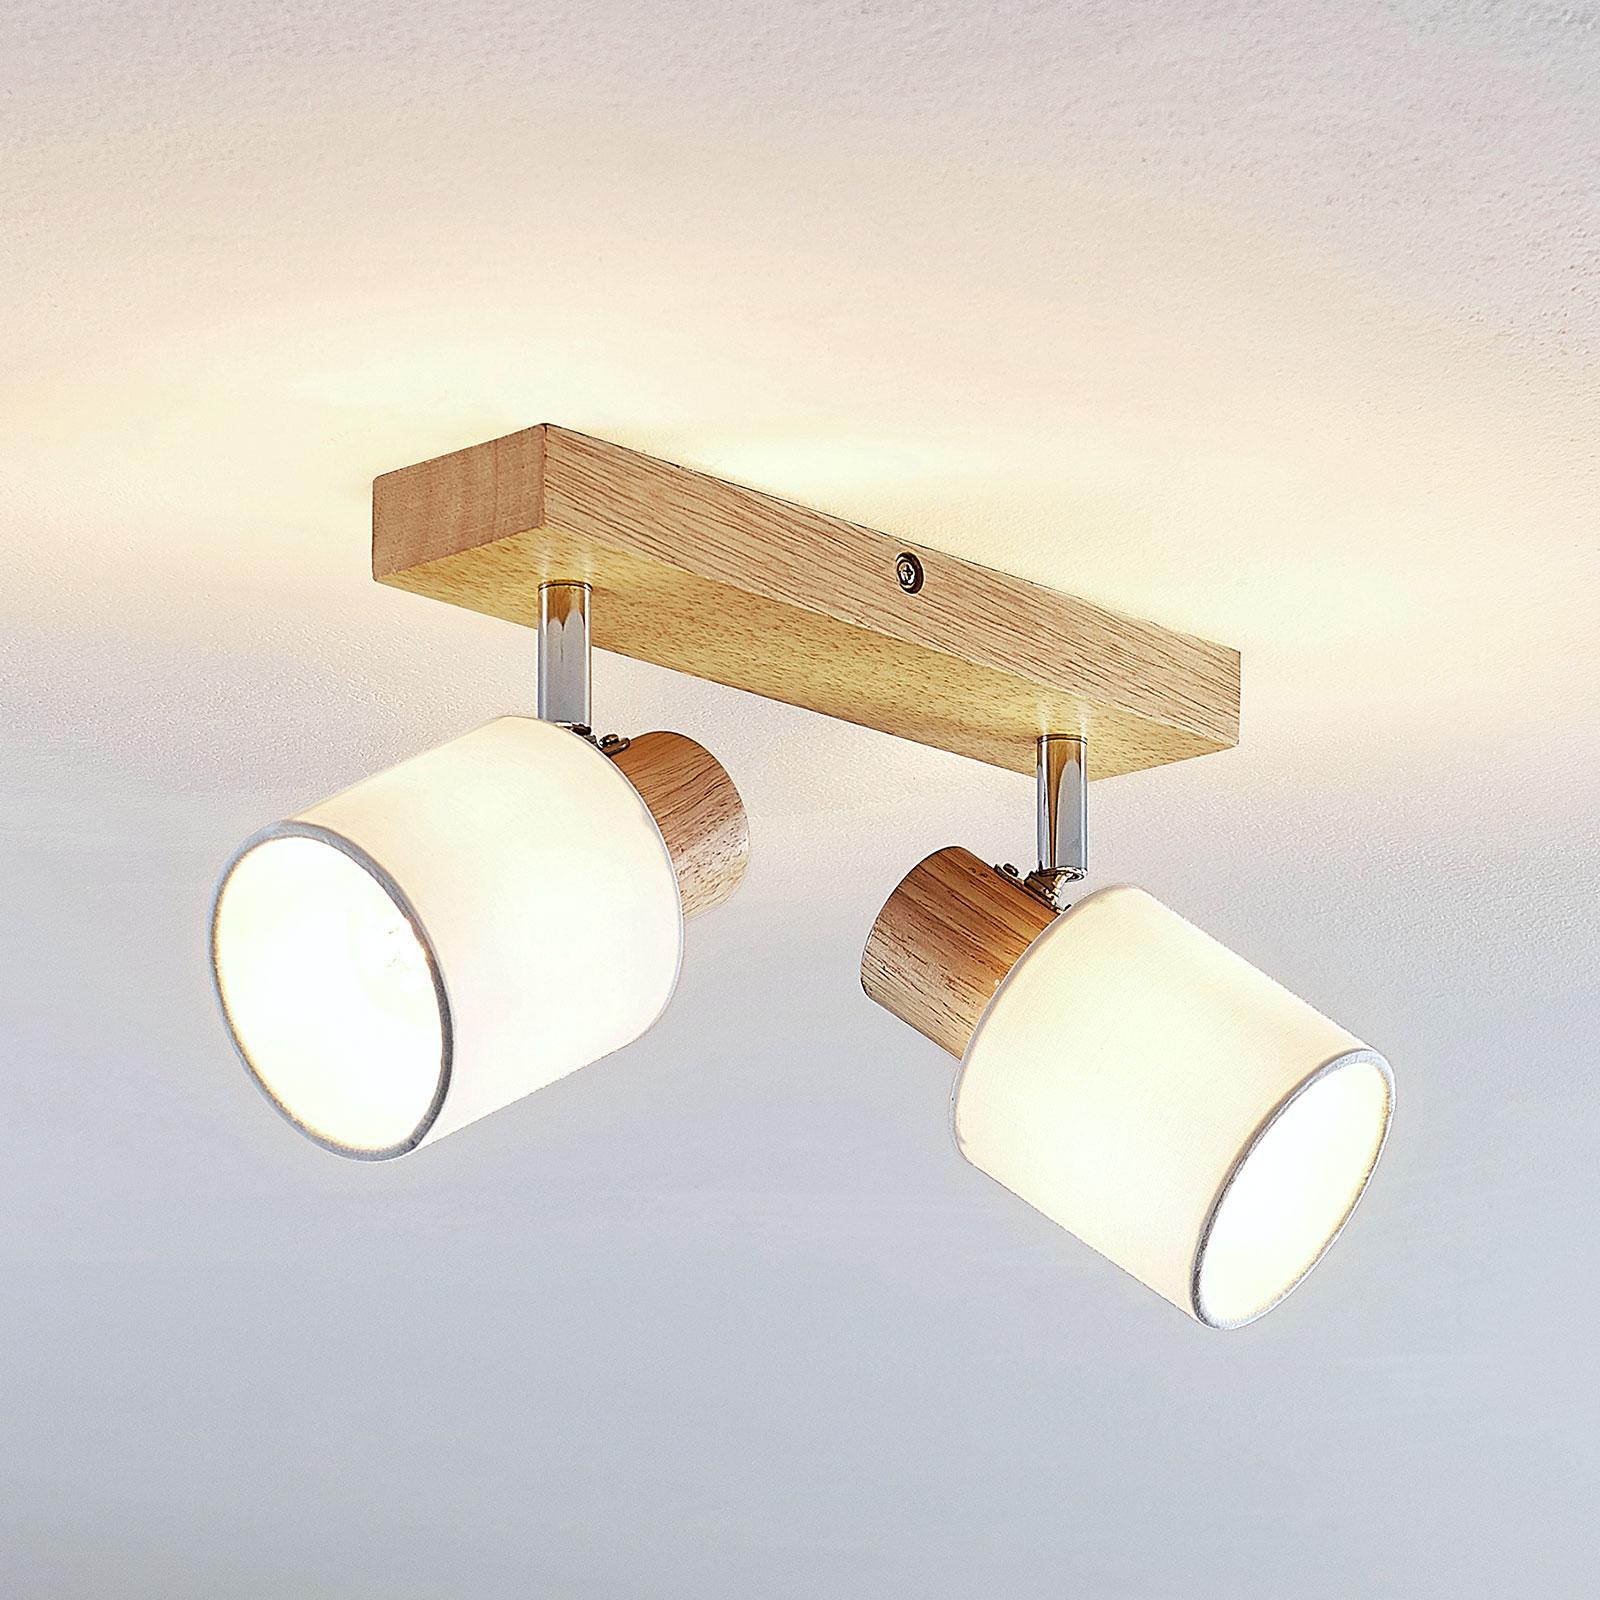 Lindby Wanessa foco de techo, 2 luces